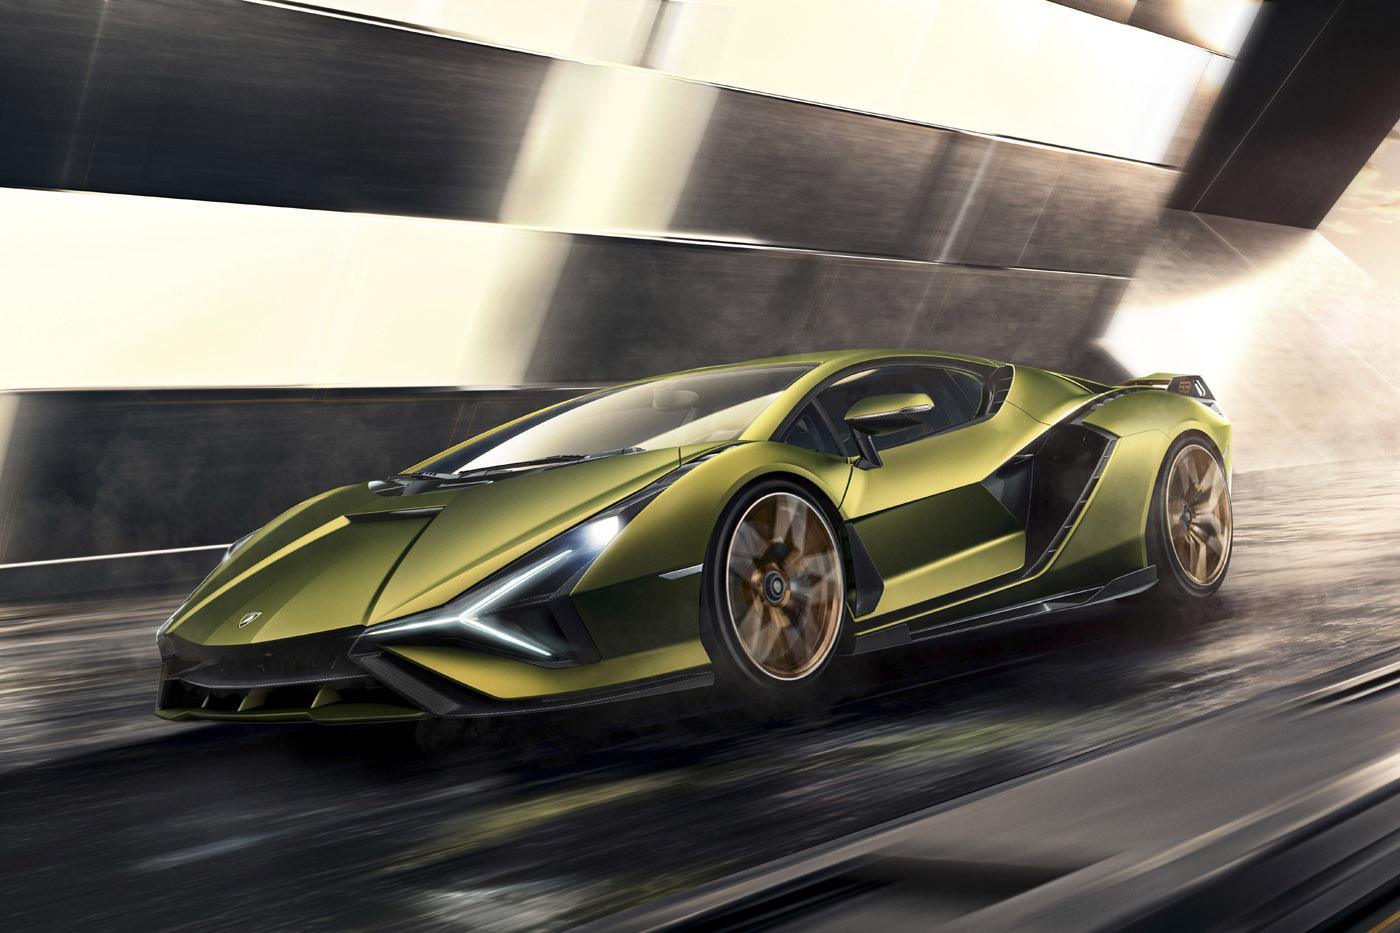 Premiera Lamborghini Sián, artykuły motoryzacyjne